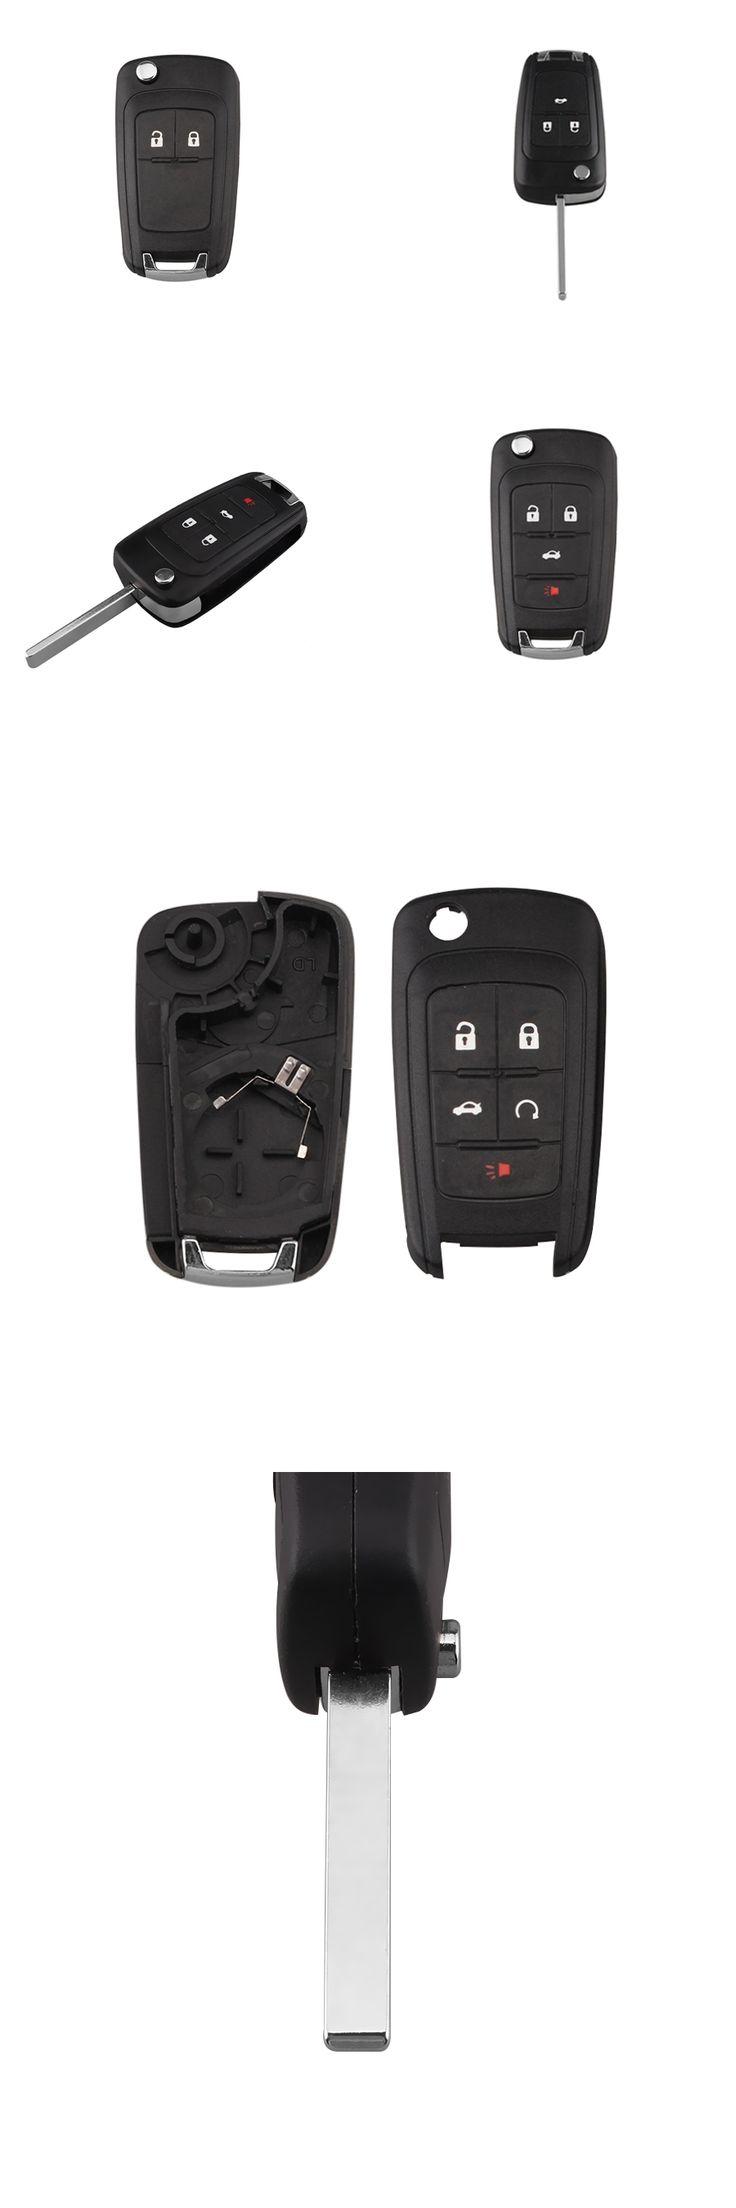 LARATH 2/3/4/5Buttons Remote Key Shell For Chevrolet Camaro Cruze Equinox Spark Malibu Sonic For Zafira Meriva car key shell FOB